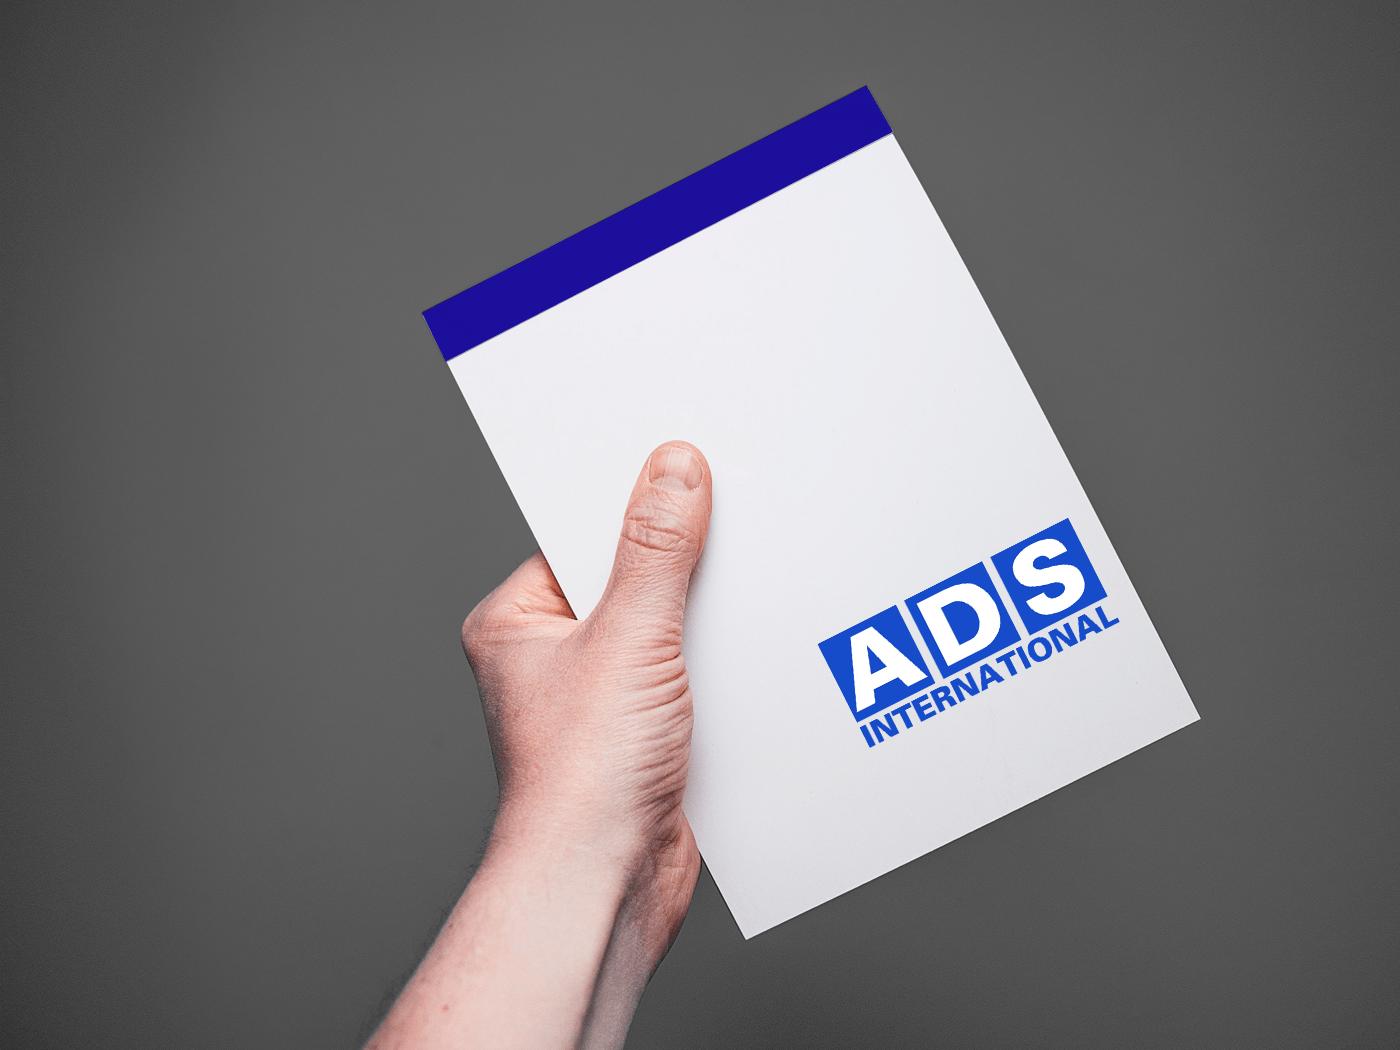 logo-on-noteblock-ADS-International